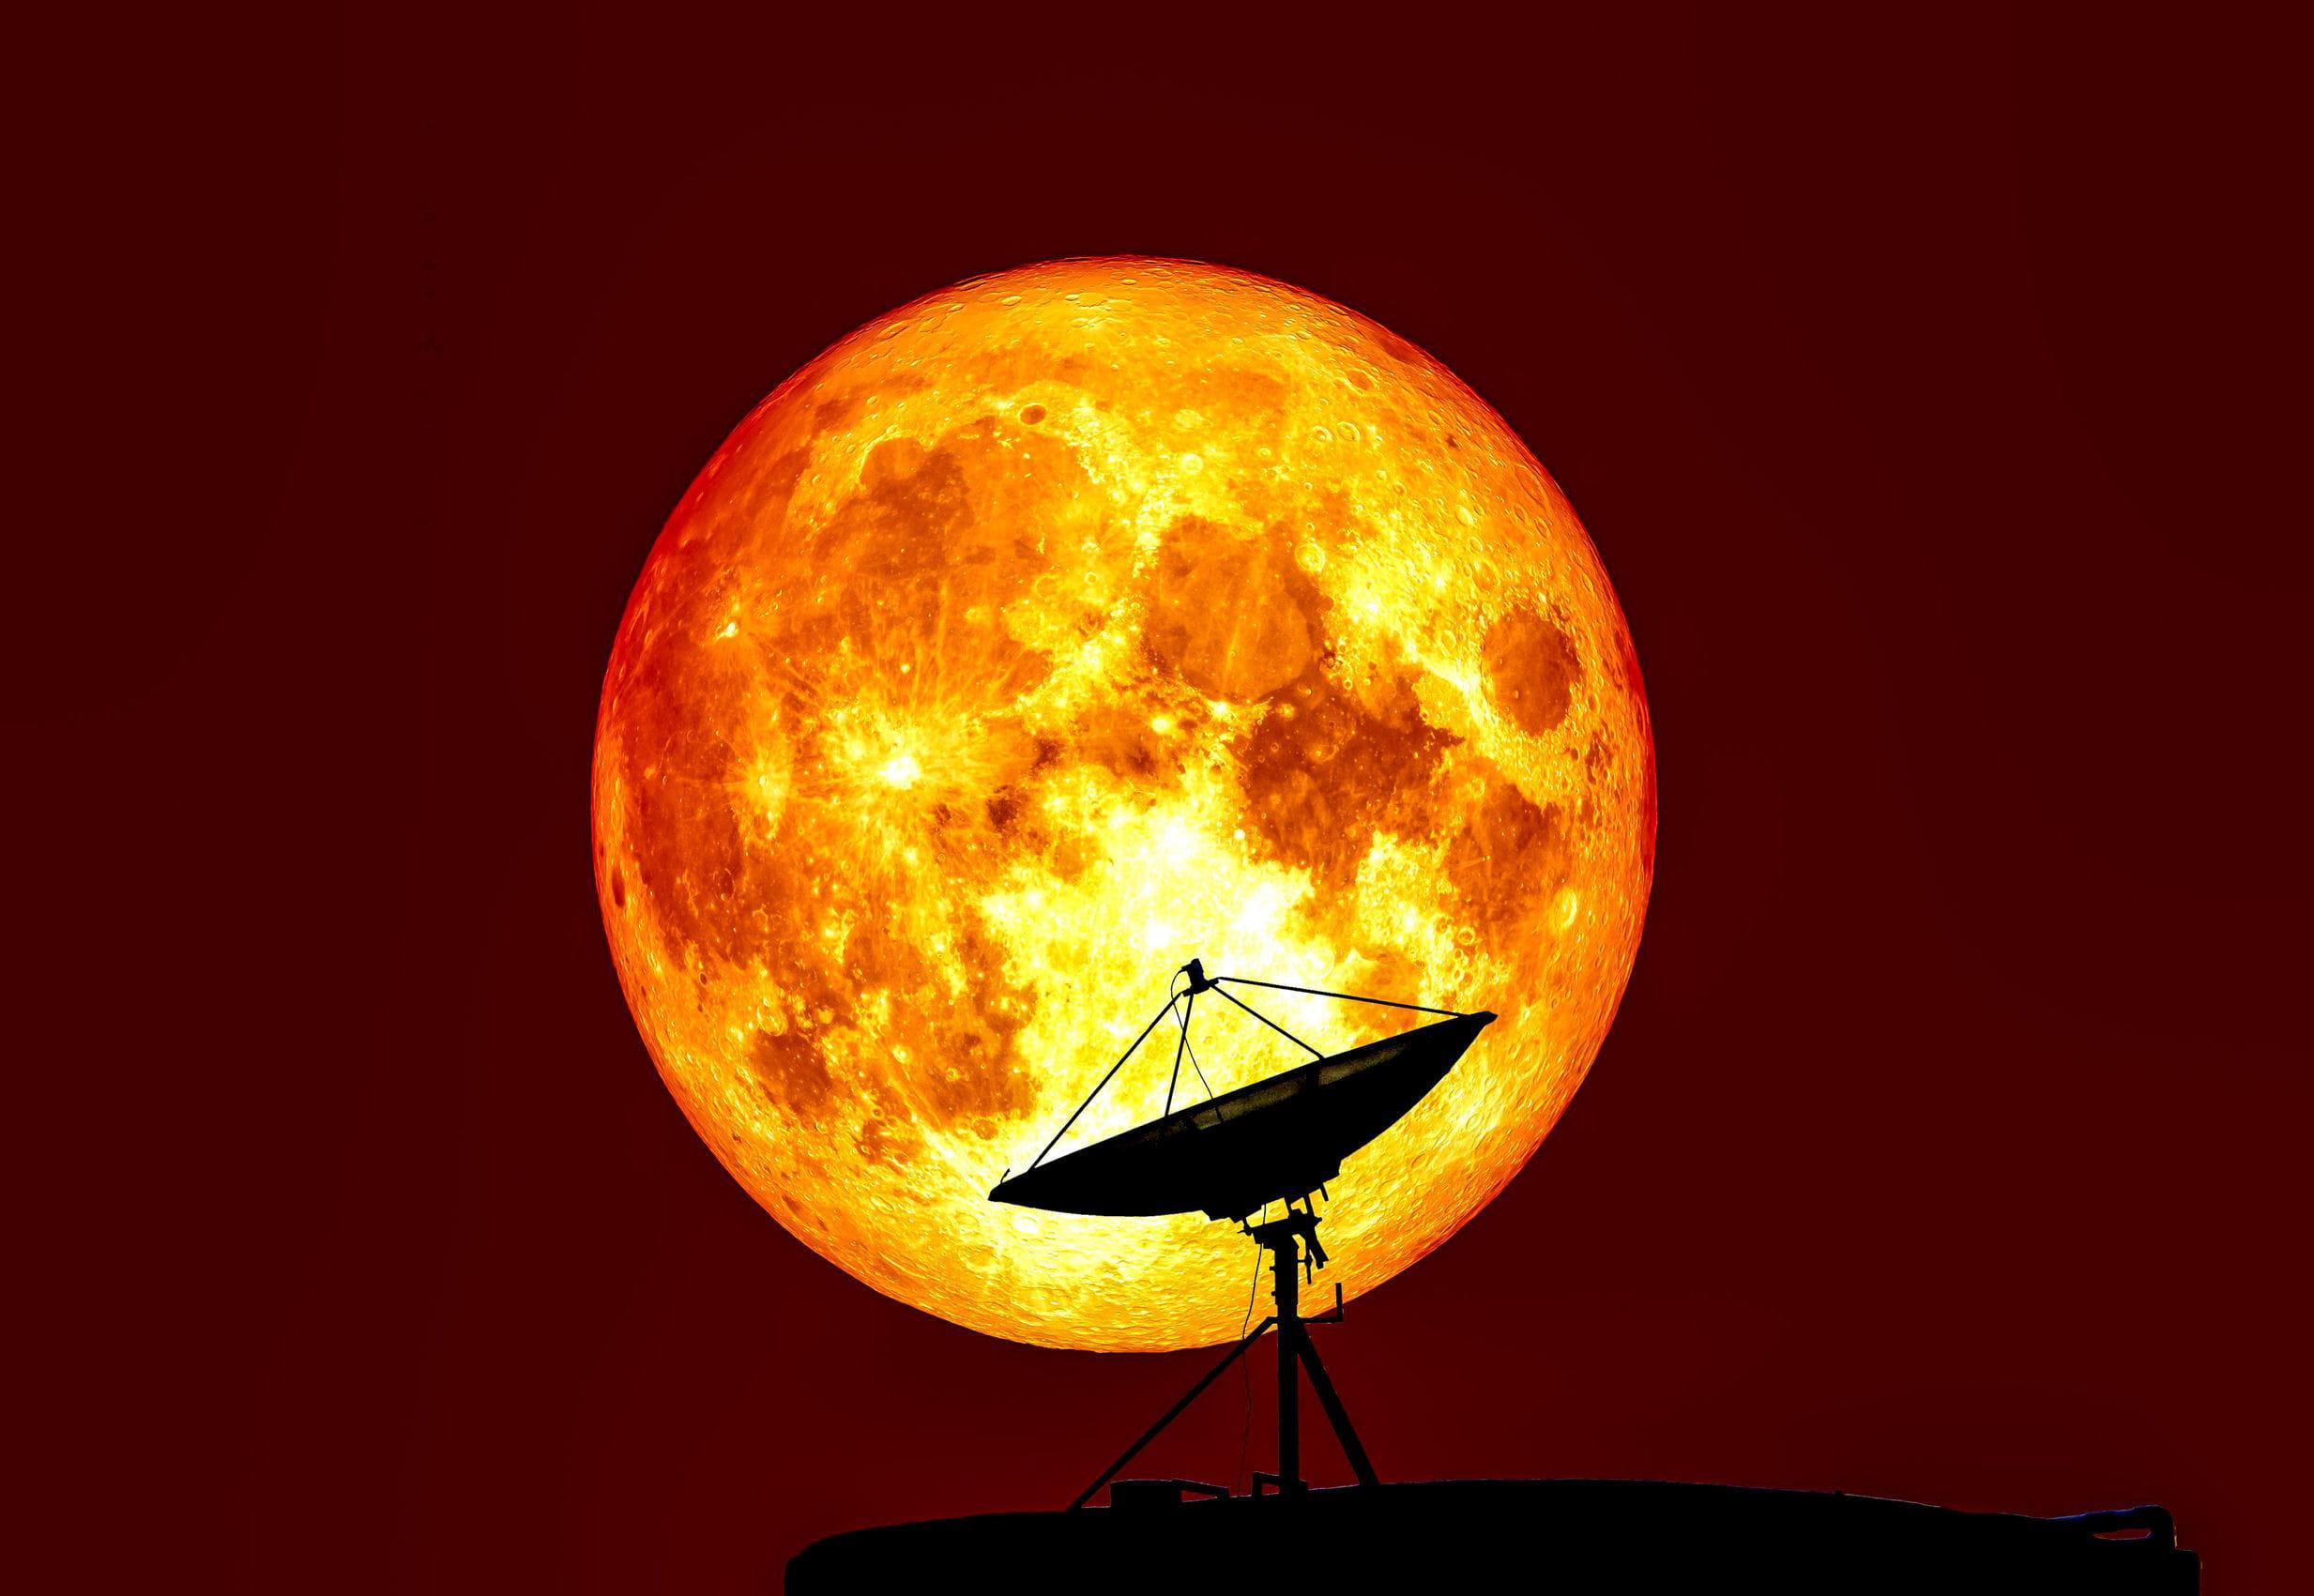 Super Lune : faites partager vos photos